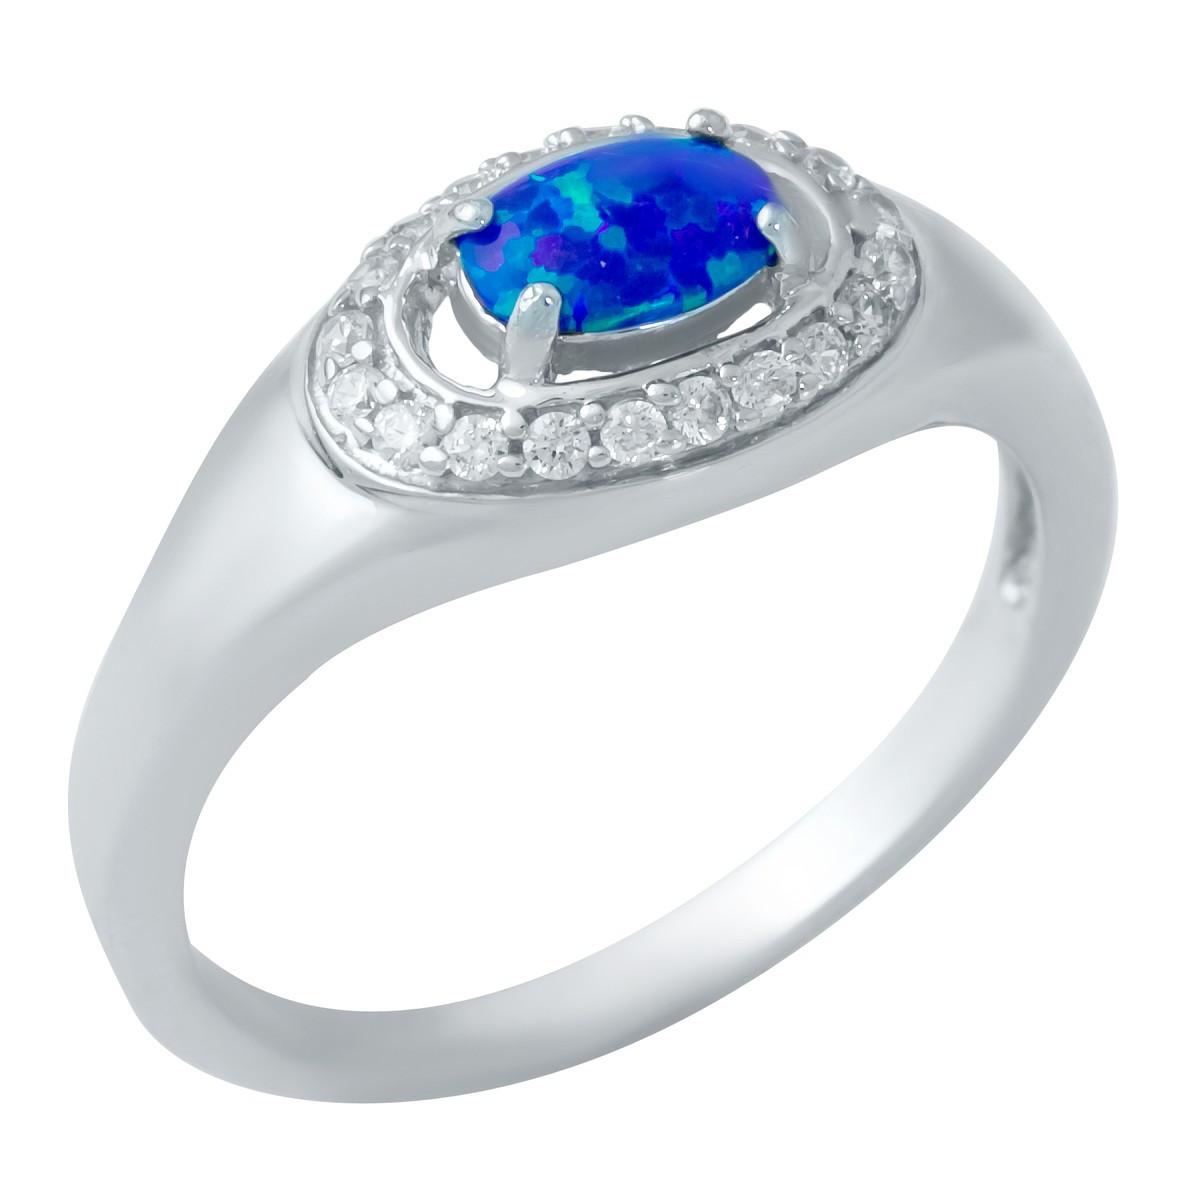 Серебряное кольцо DreamJewelry с опалом (1948279) 17.5 размер